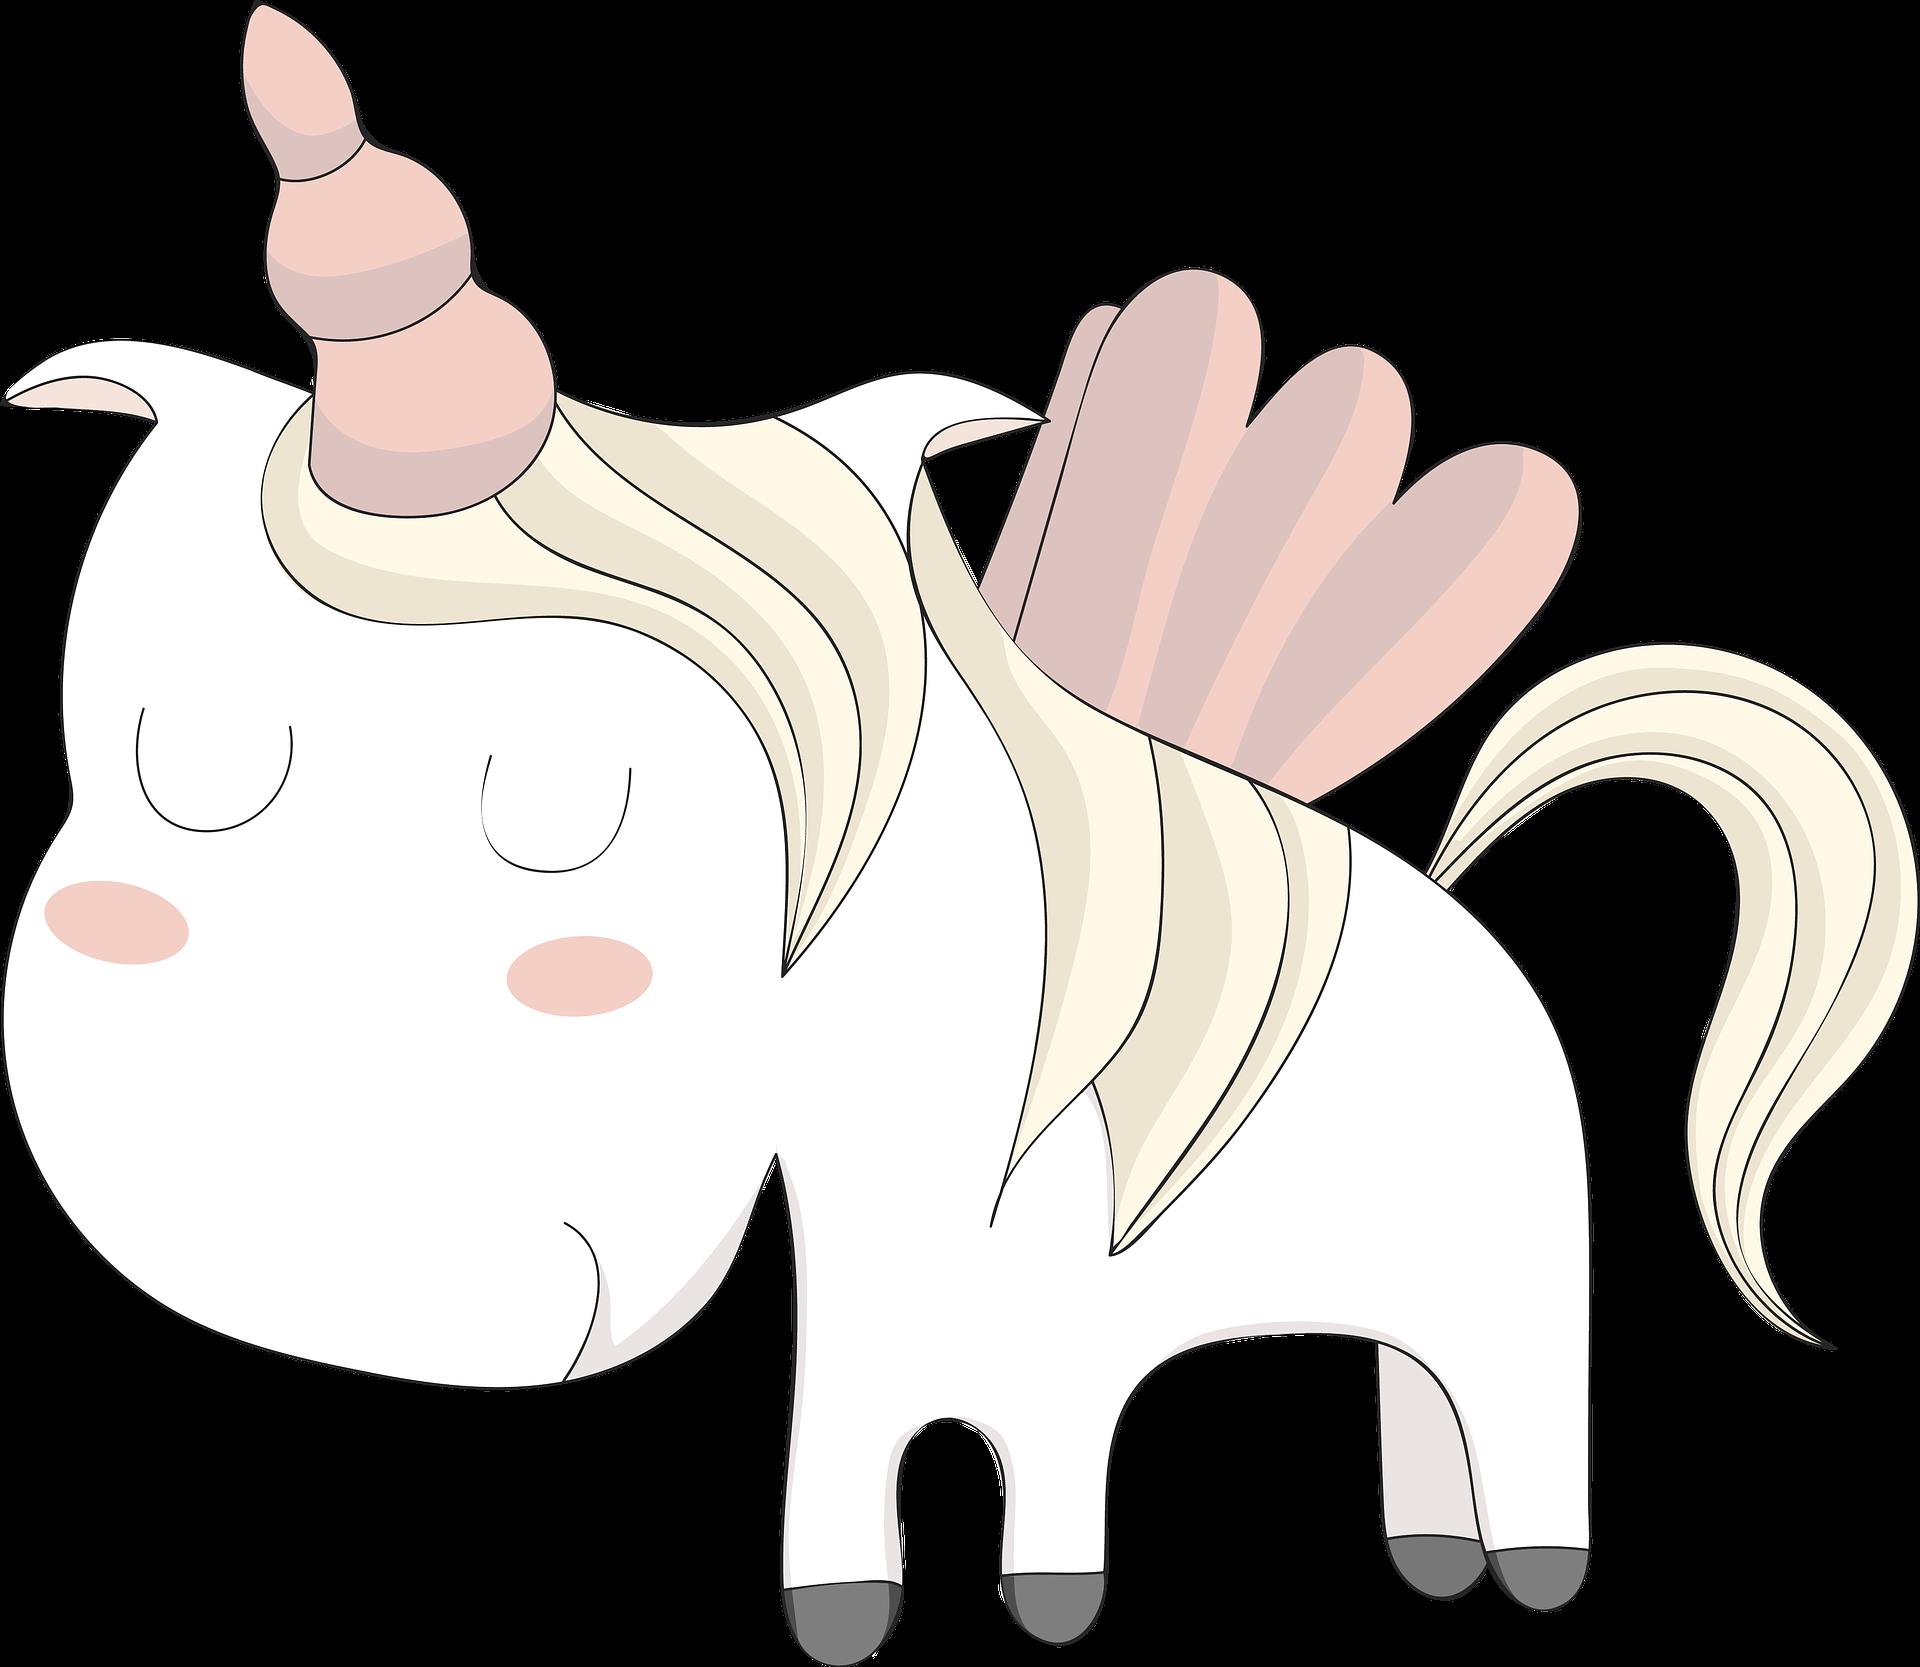 unicorn-3793757_1920